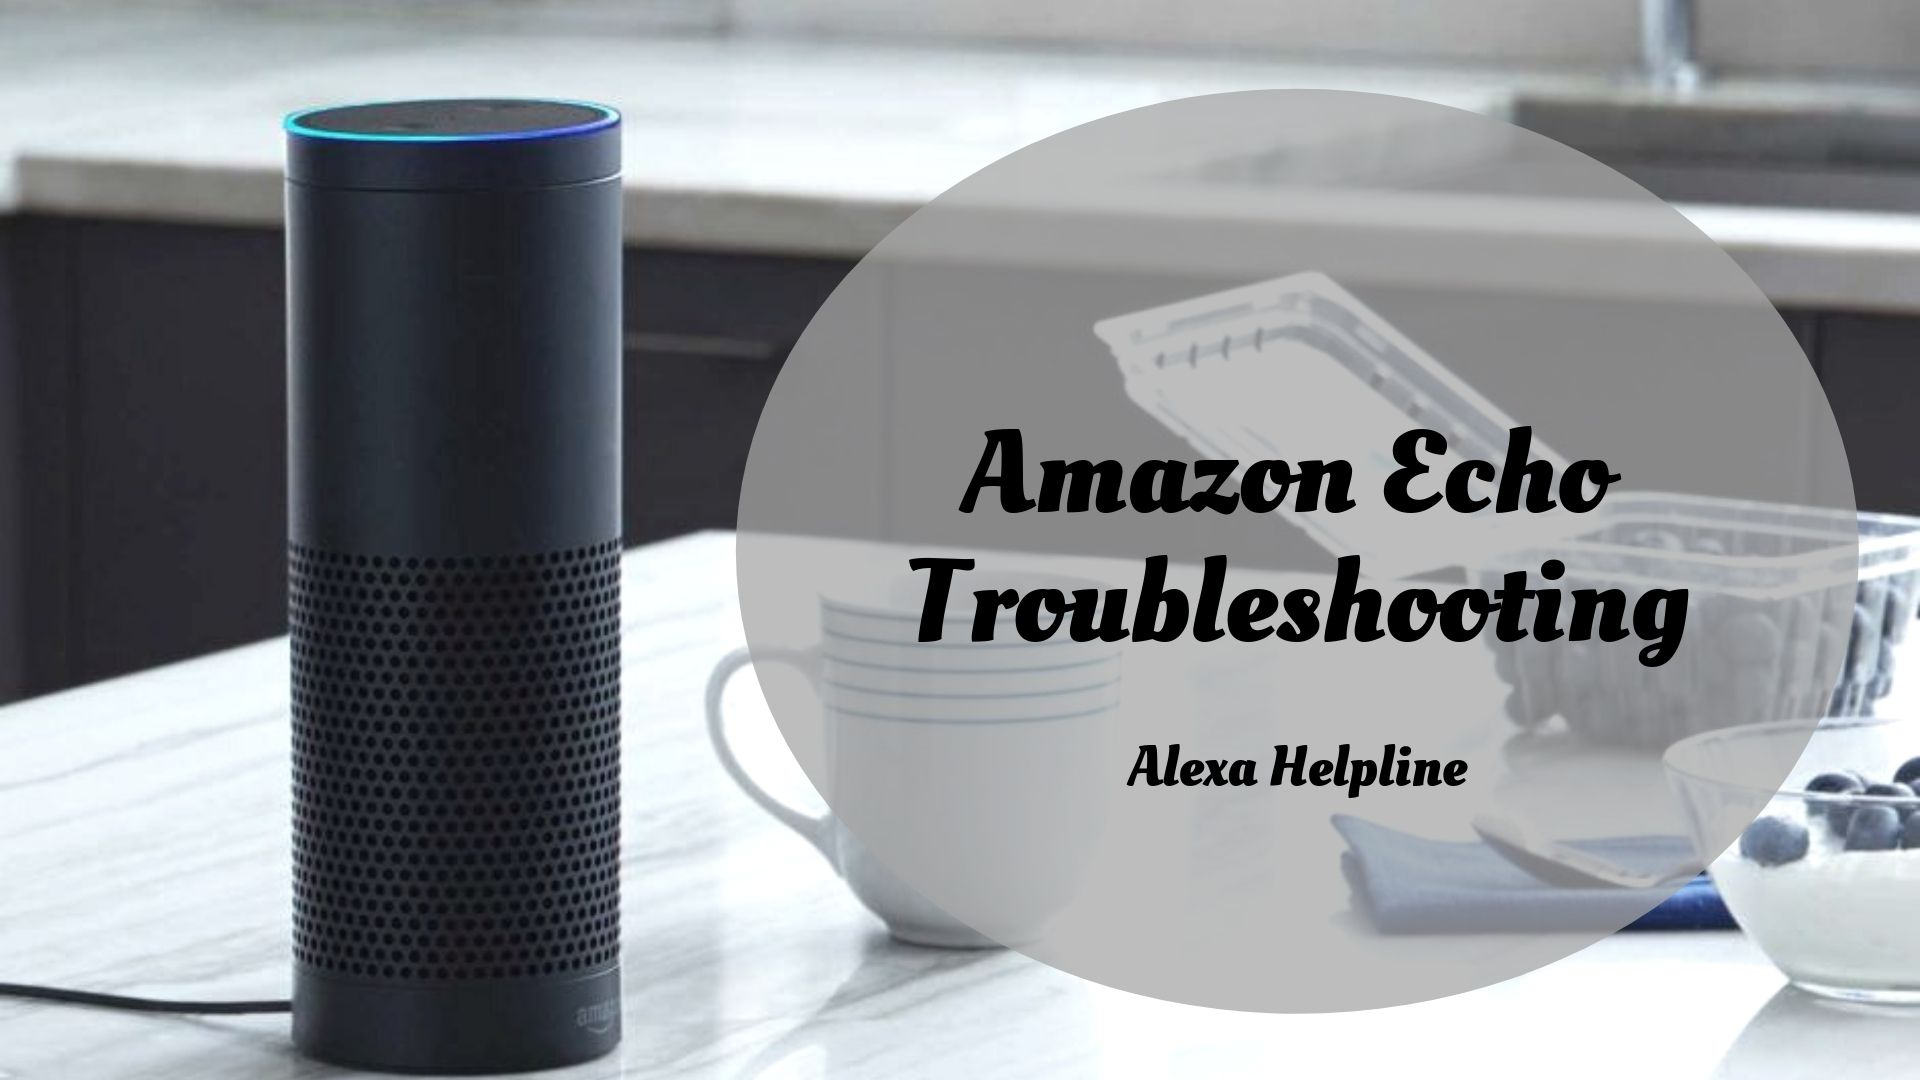 Amazon Alexa Troubleshooting Amazon alexa devices, Alexa